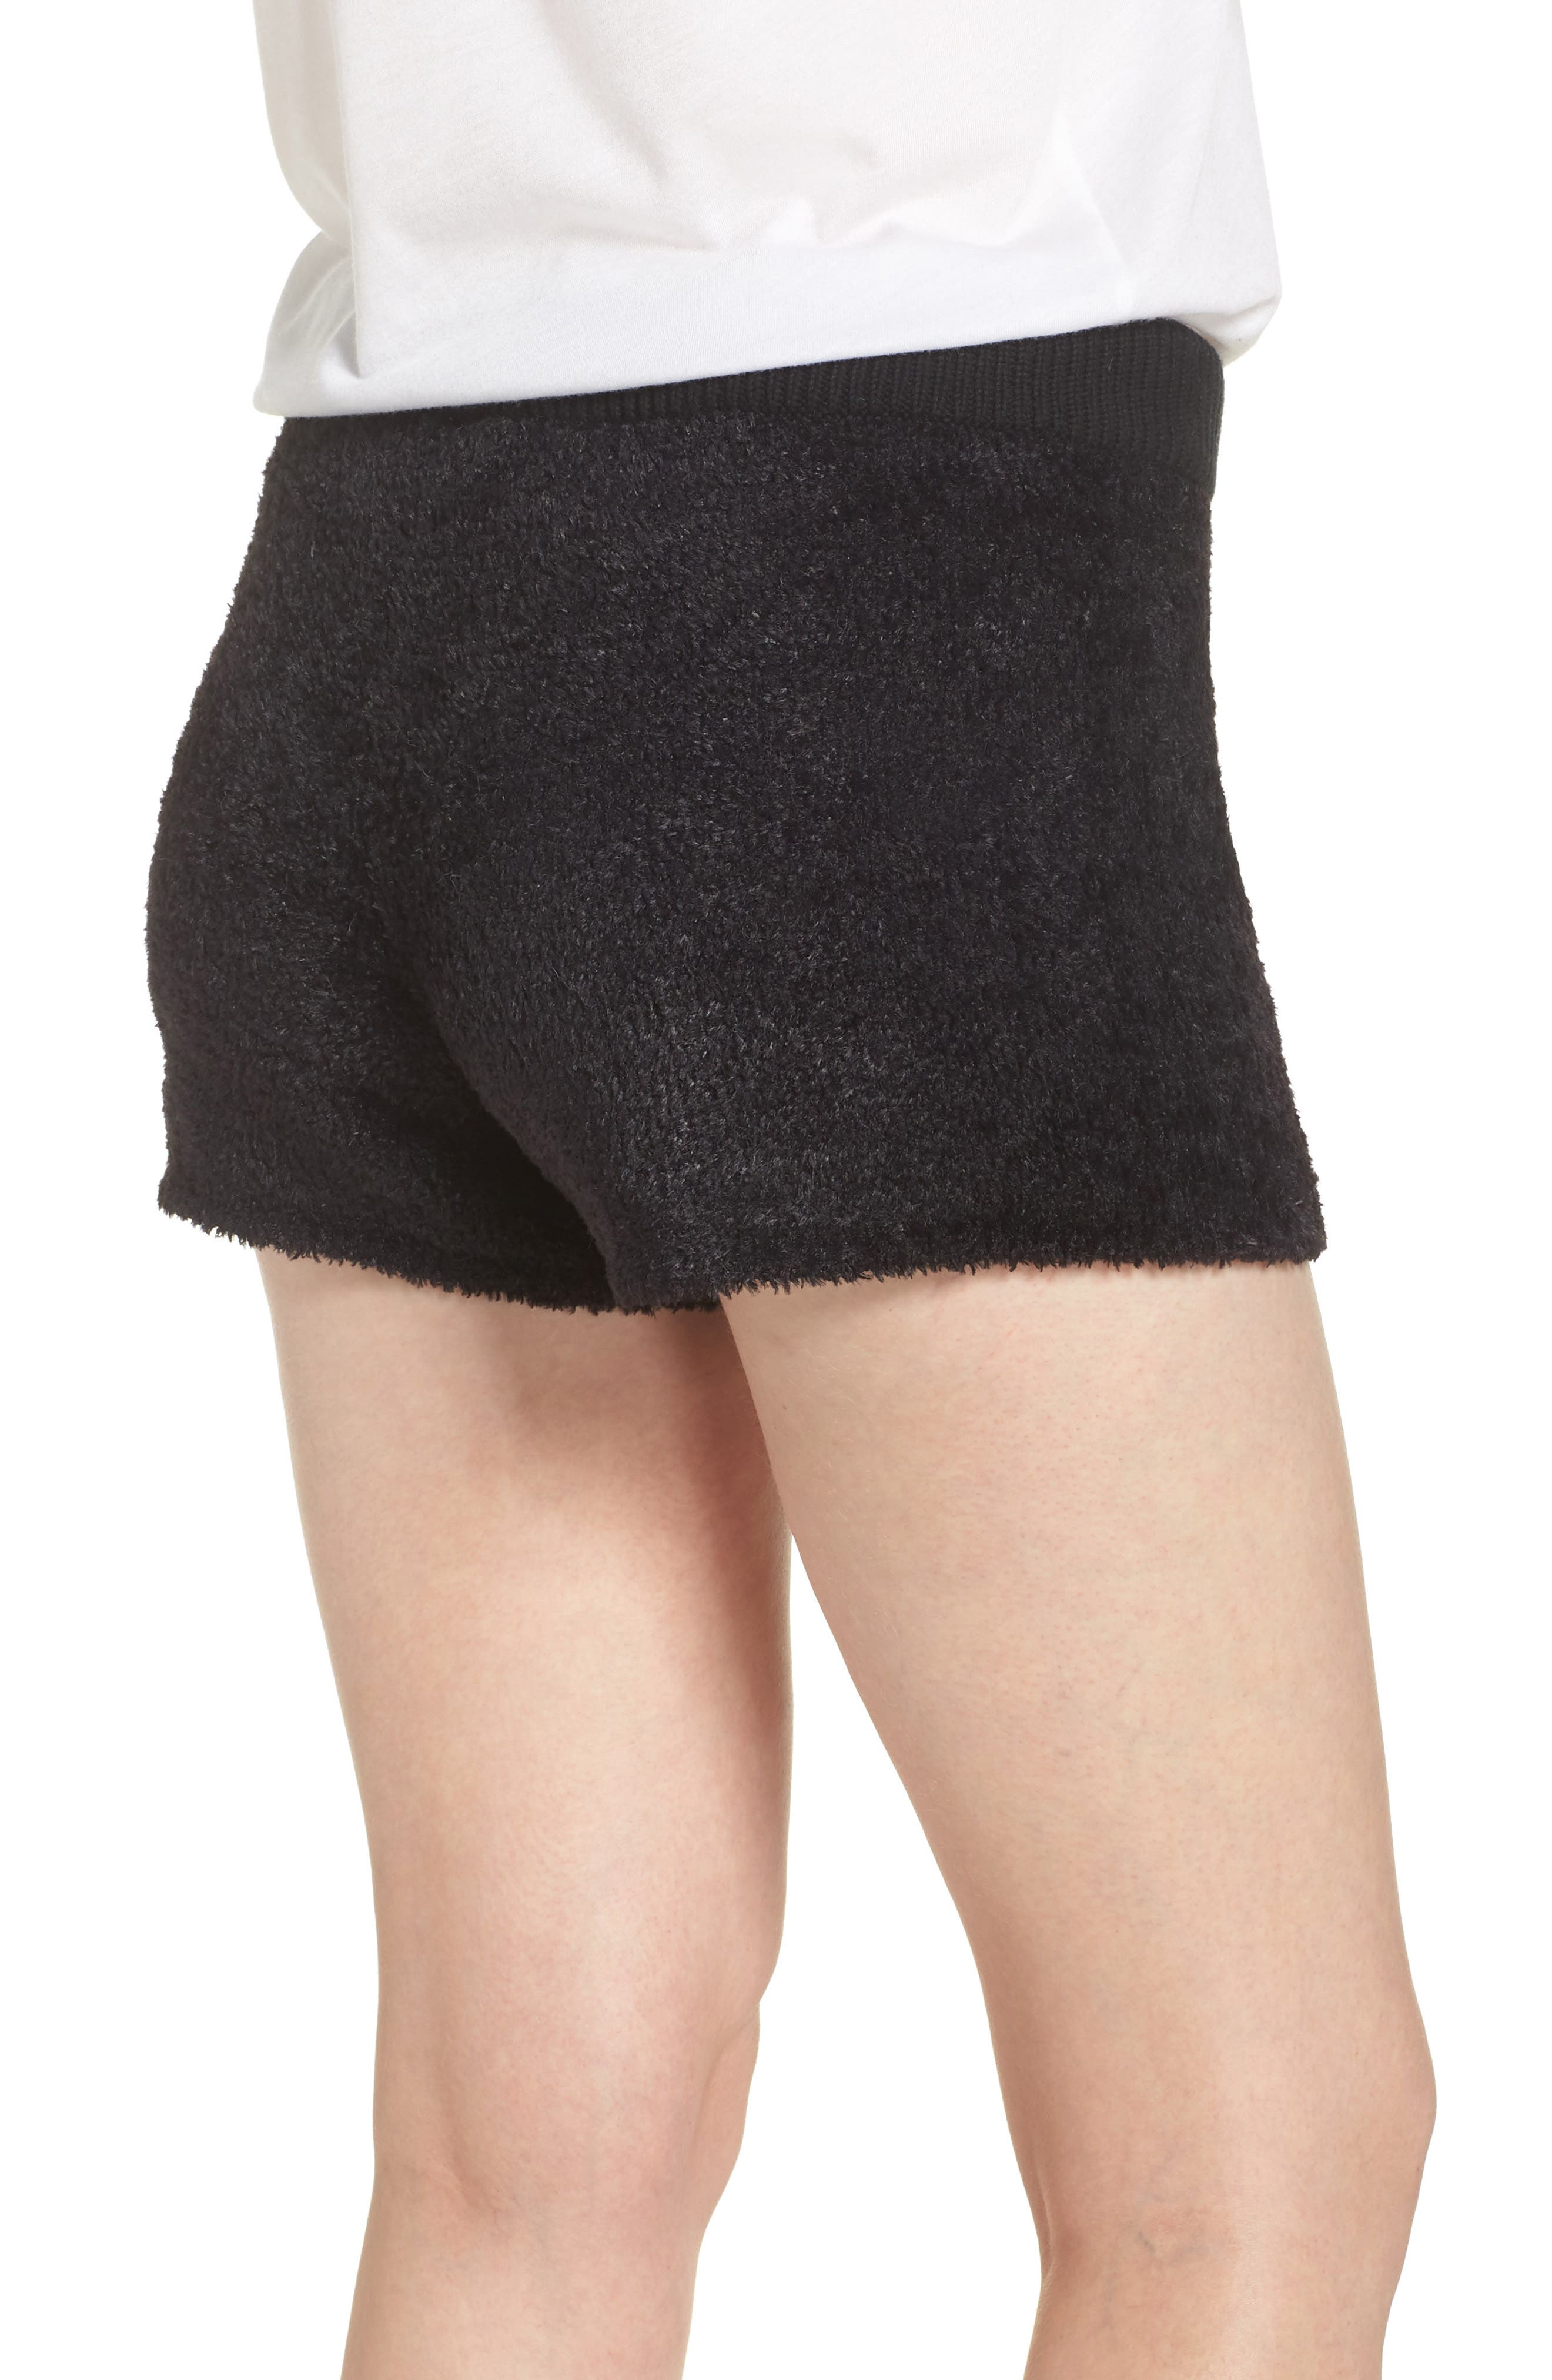 Fuzzy Lounge Shorts,                             Alternate thumbnail 2, color,                             BLACK